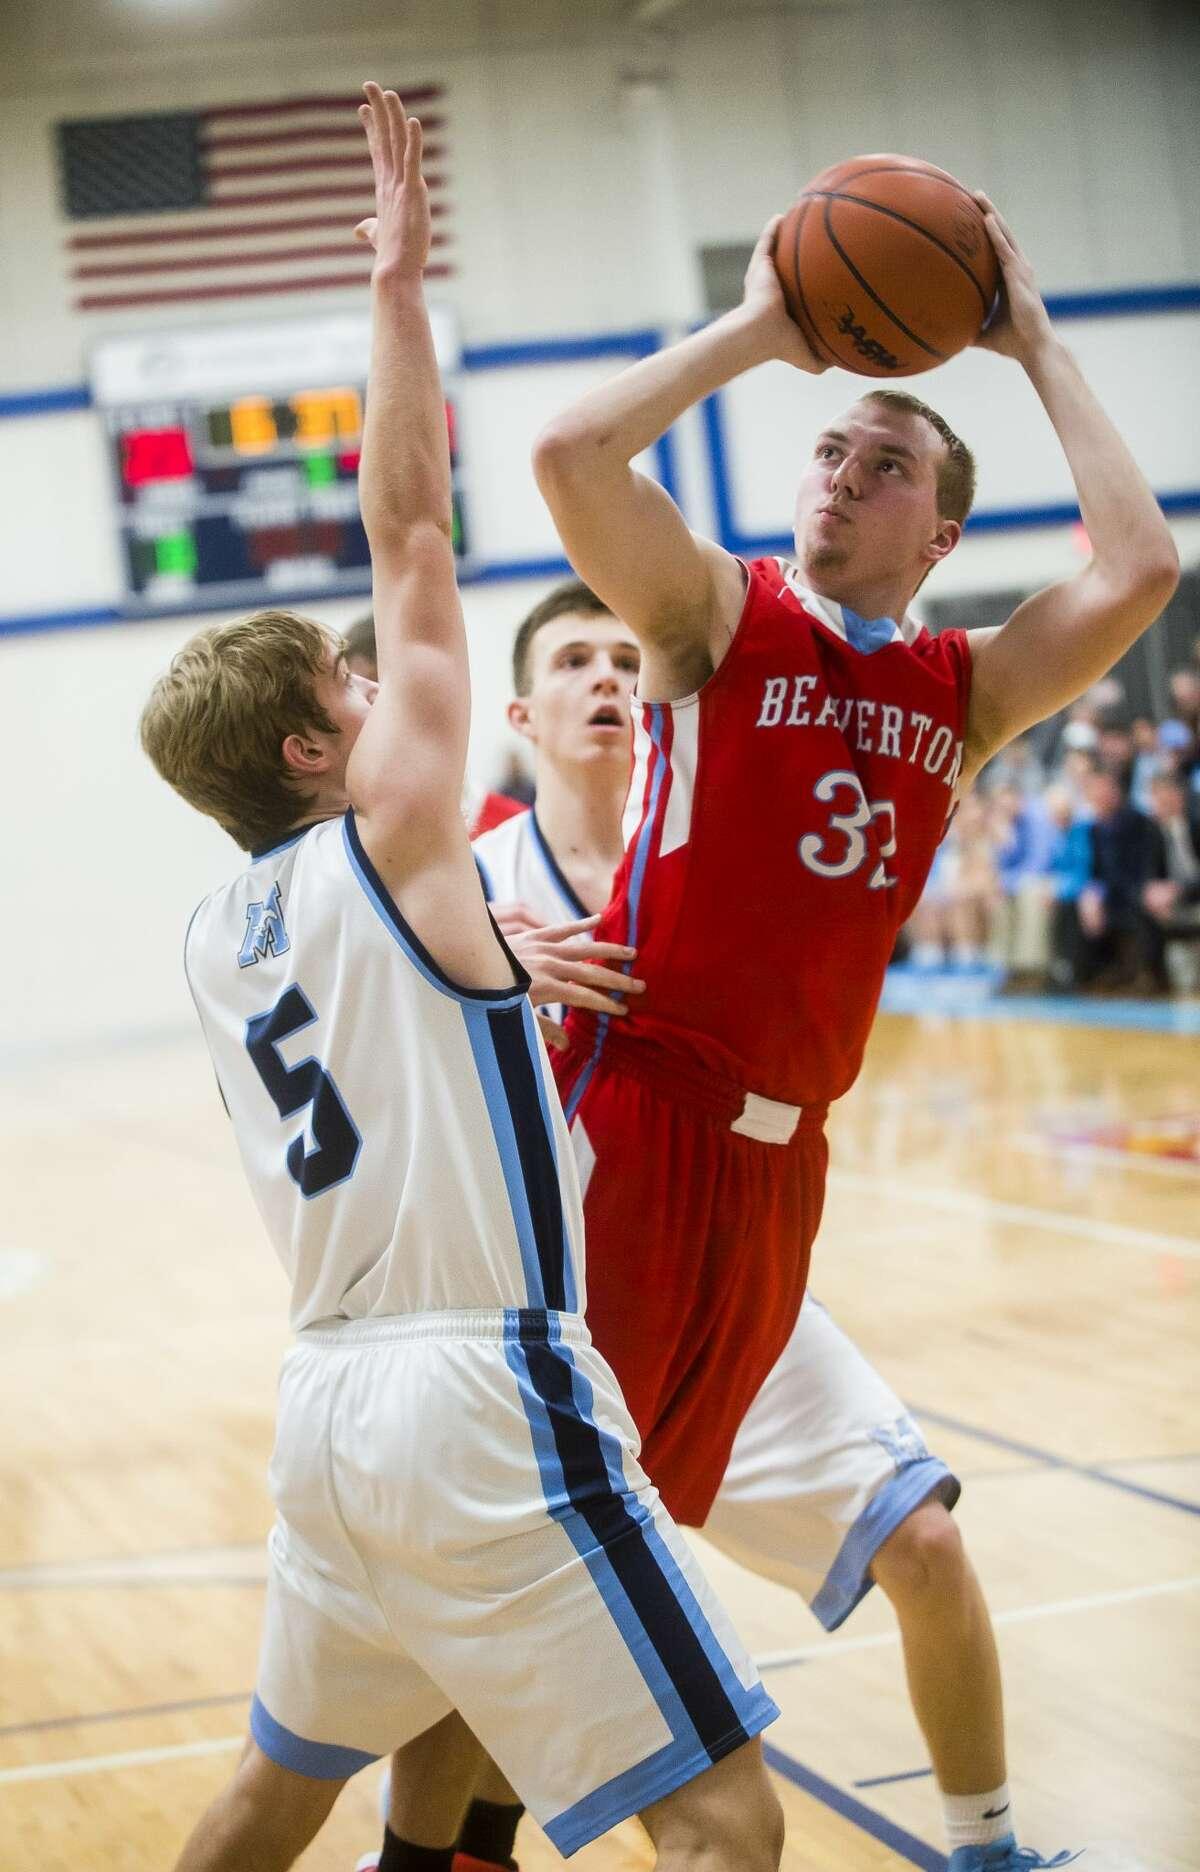 Beaverton junior Logan Gerow takes a shot while Meridian senior Garrett Stockford guards him during their district championship game on Friday, March 9, 2018 at Meridian High School. (Katy Kildee/kkildee@mdn.net)